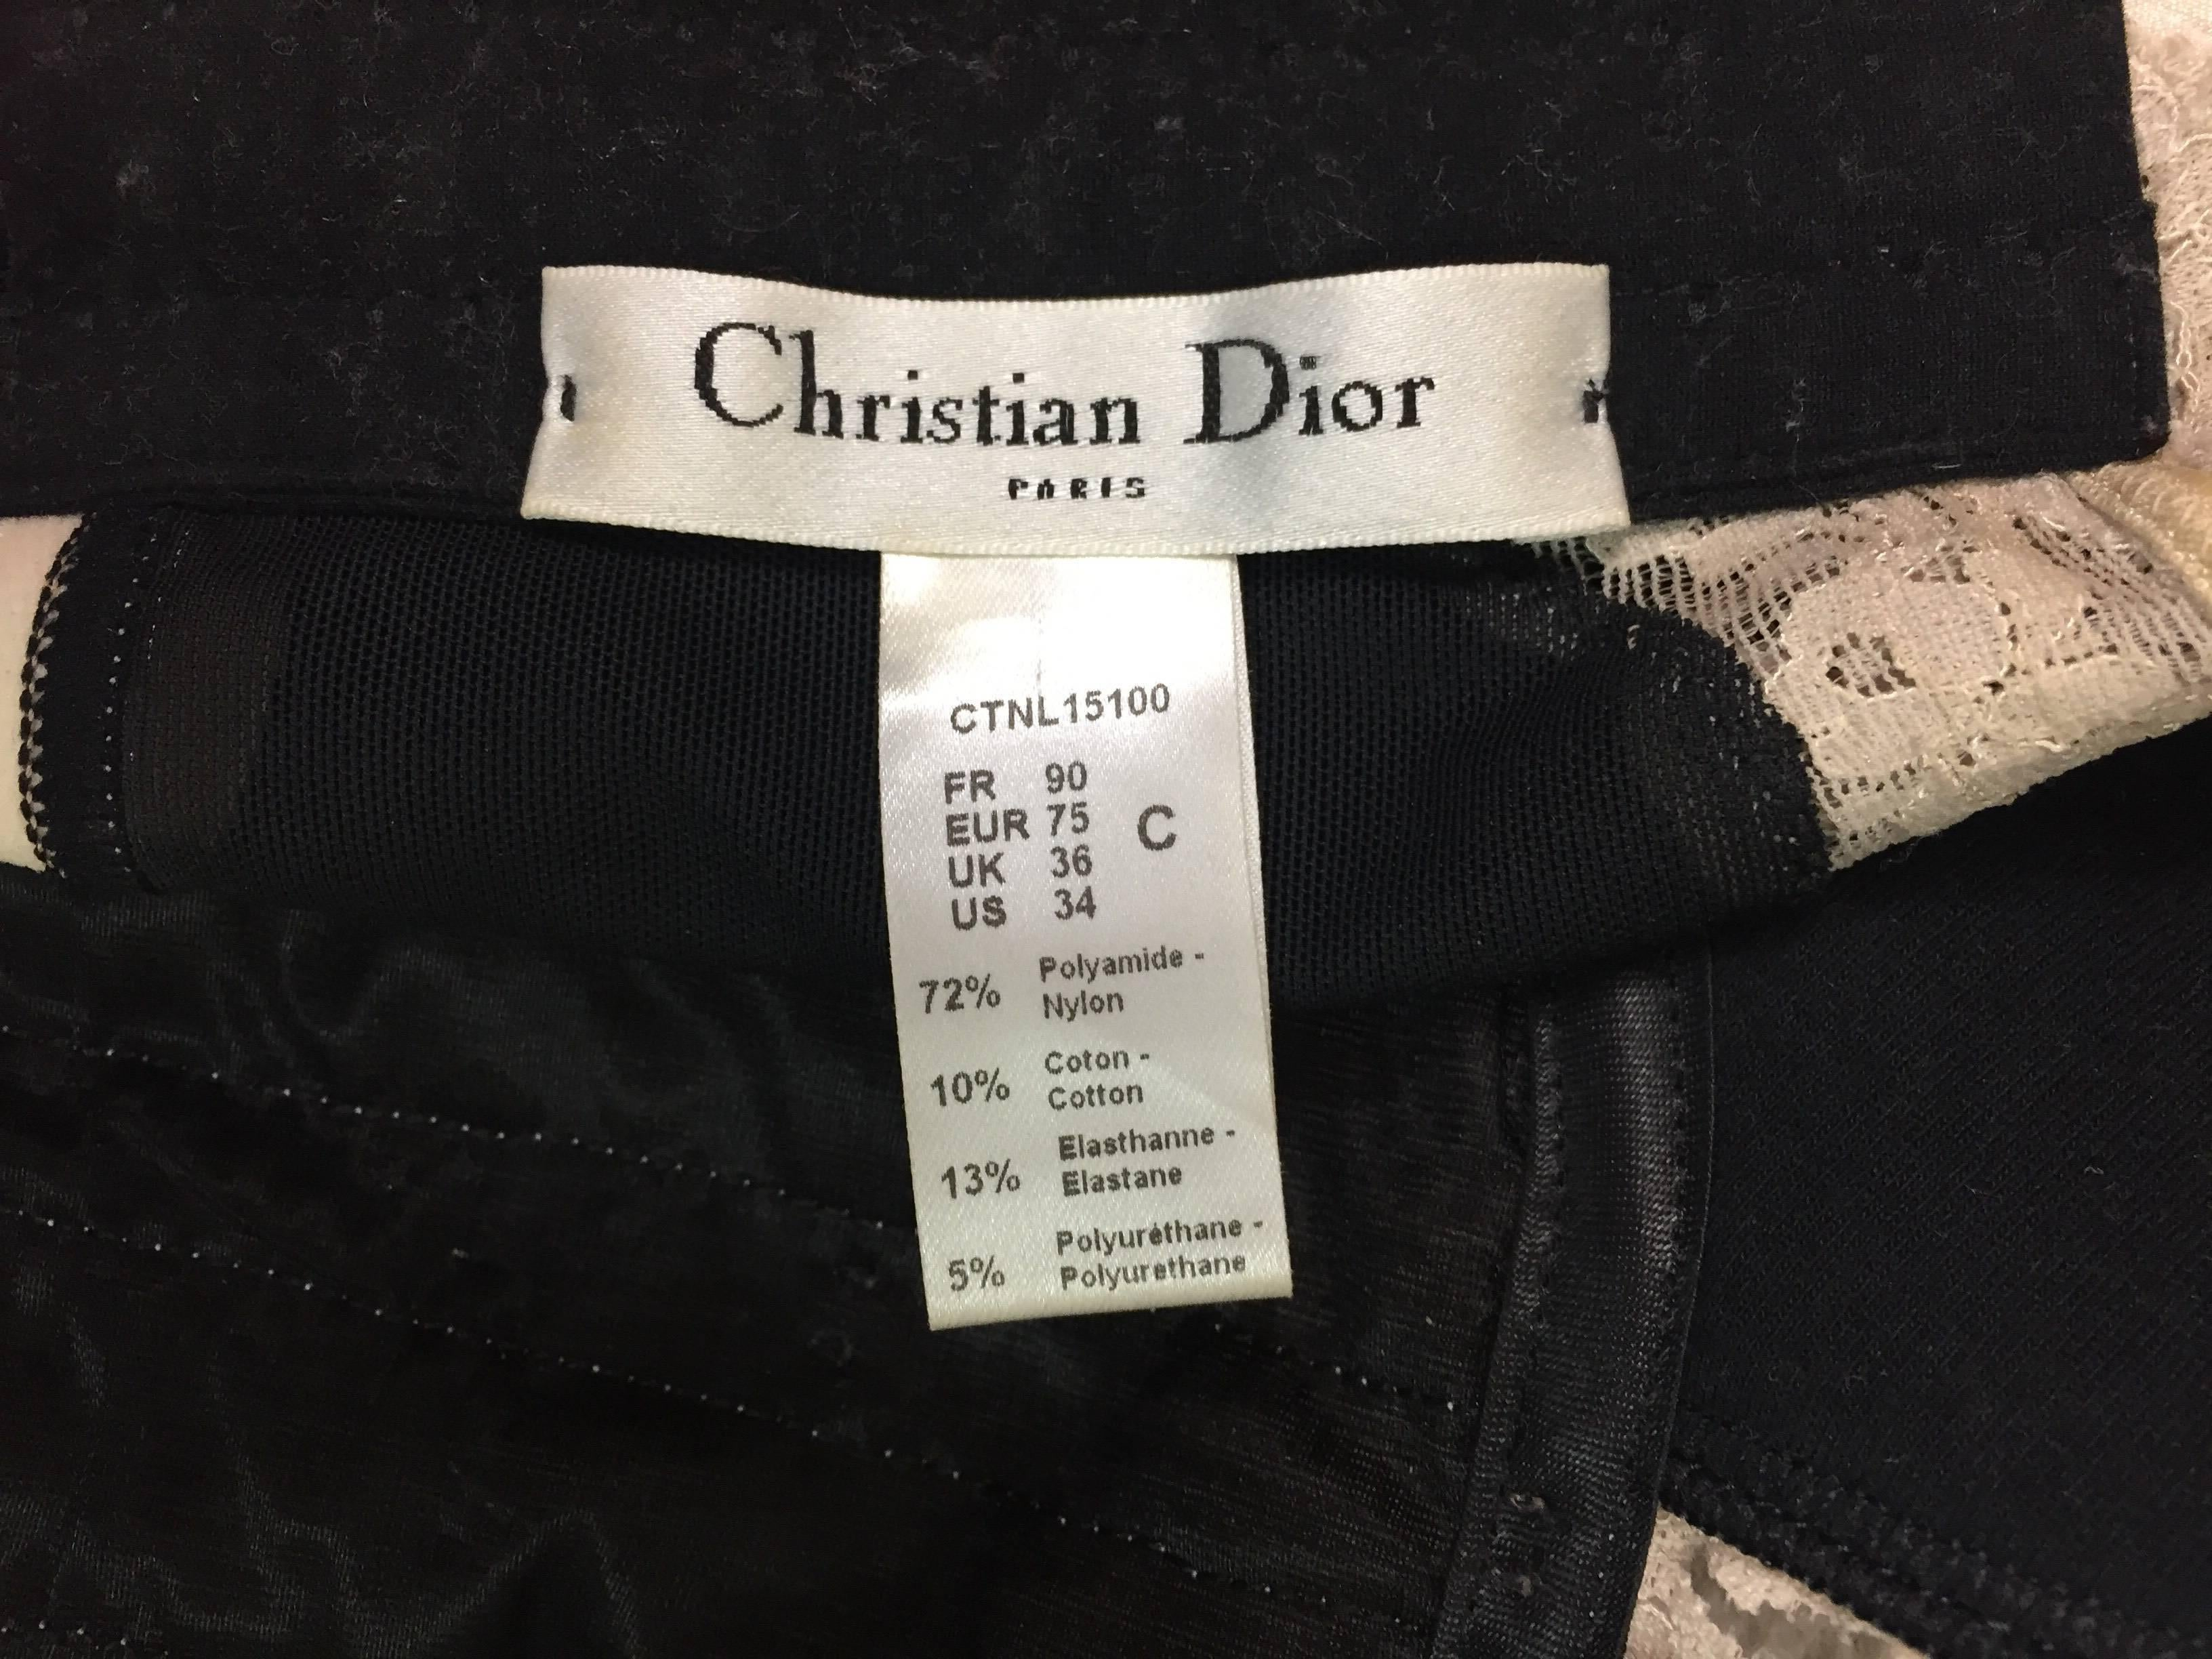 a55530dfbd2899 Christian Dior Sheer Black Mesh Padded Lace Crop Top Bra